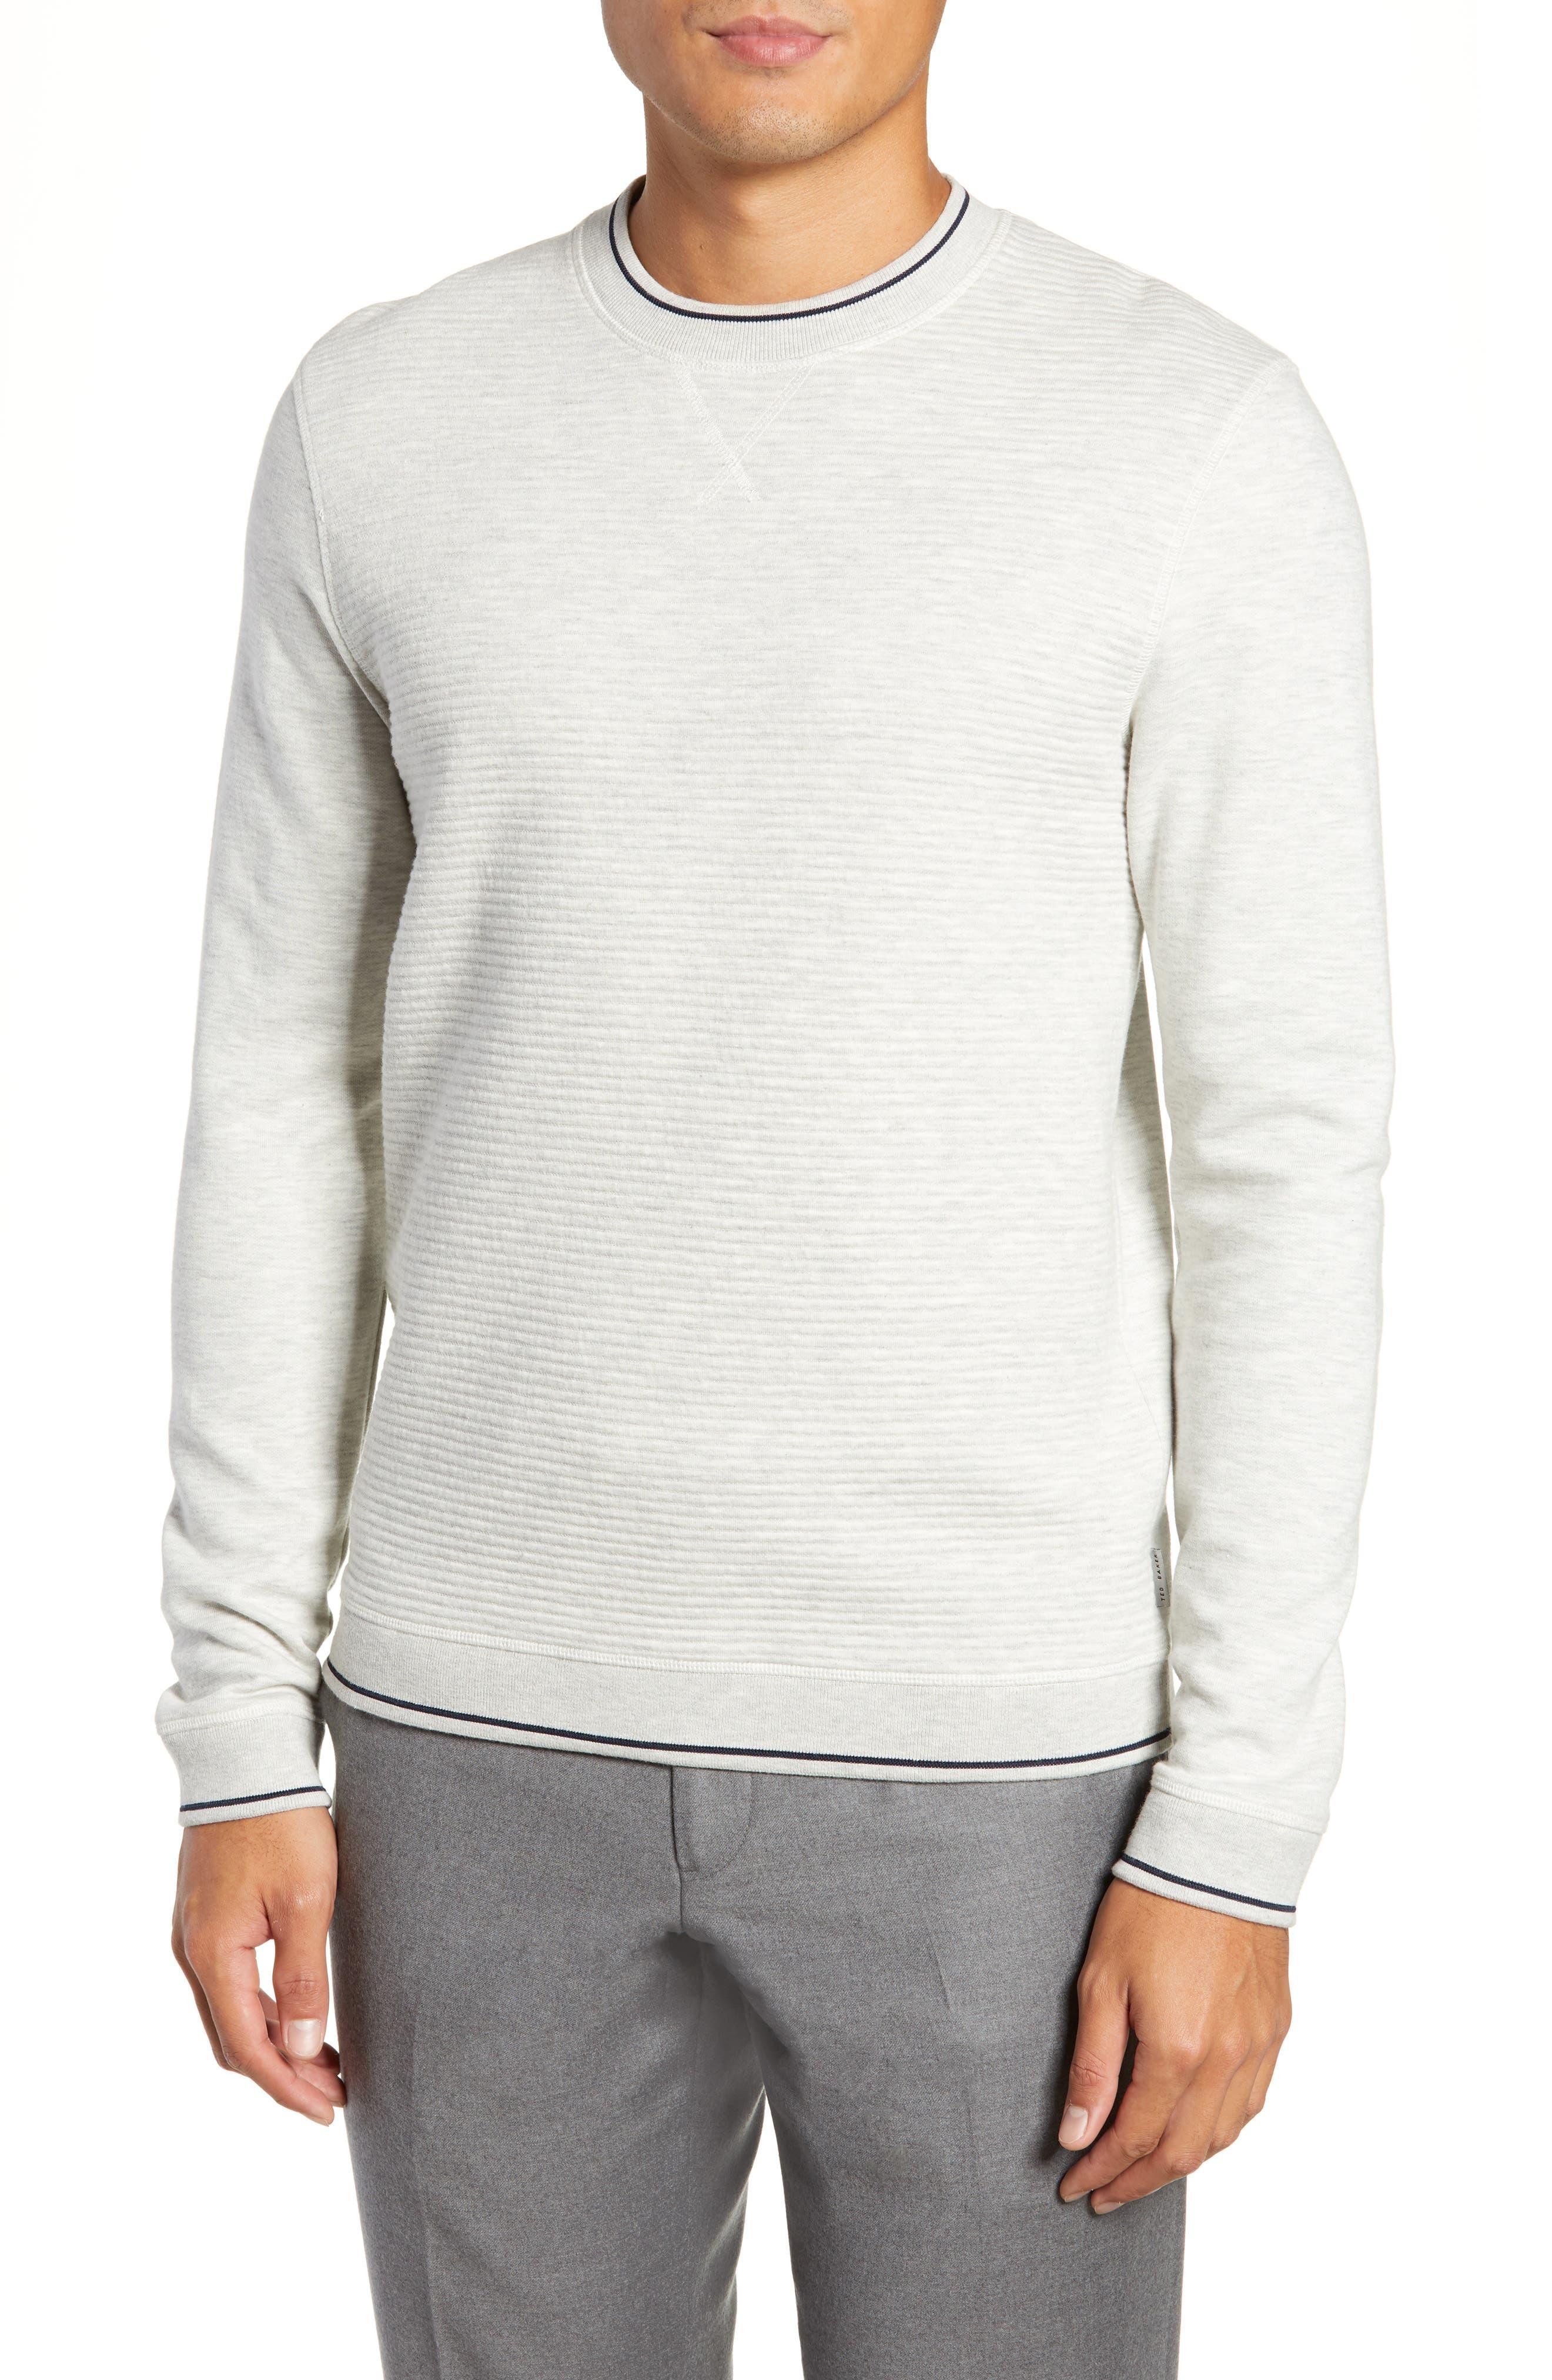 Magiics Slim Fit Quilted Sweatshirt,                             Main thumbnail 1, color,                             LIGHT GREY